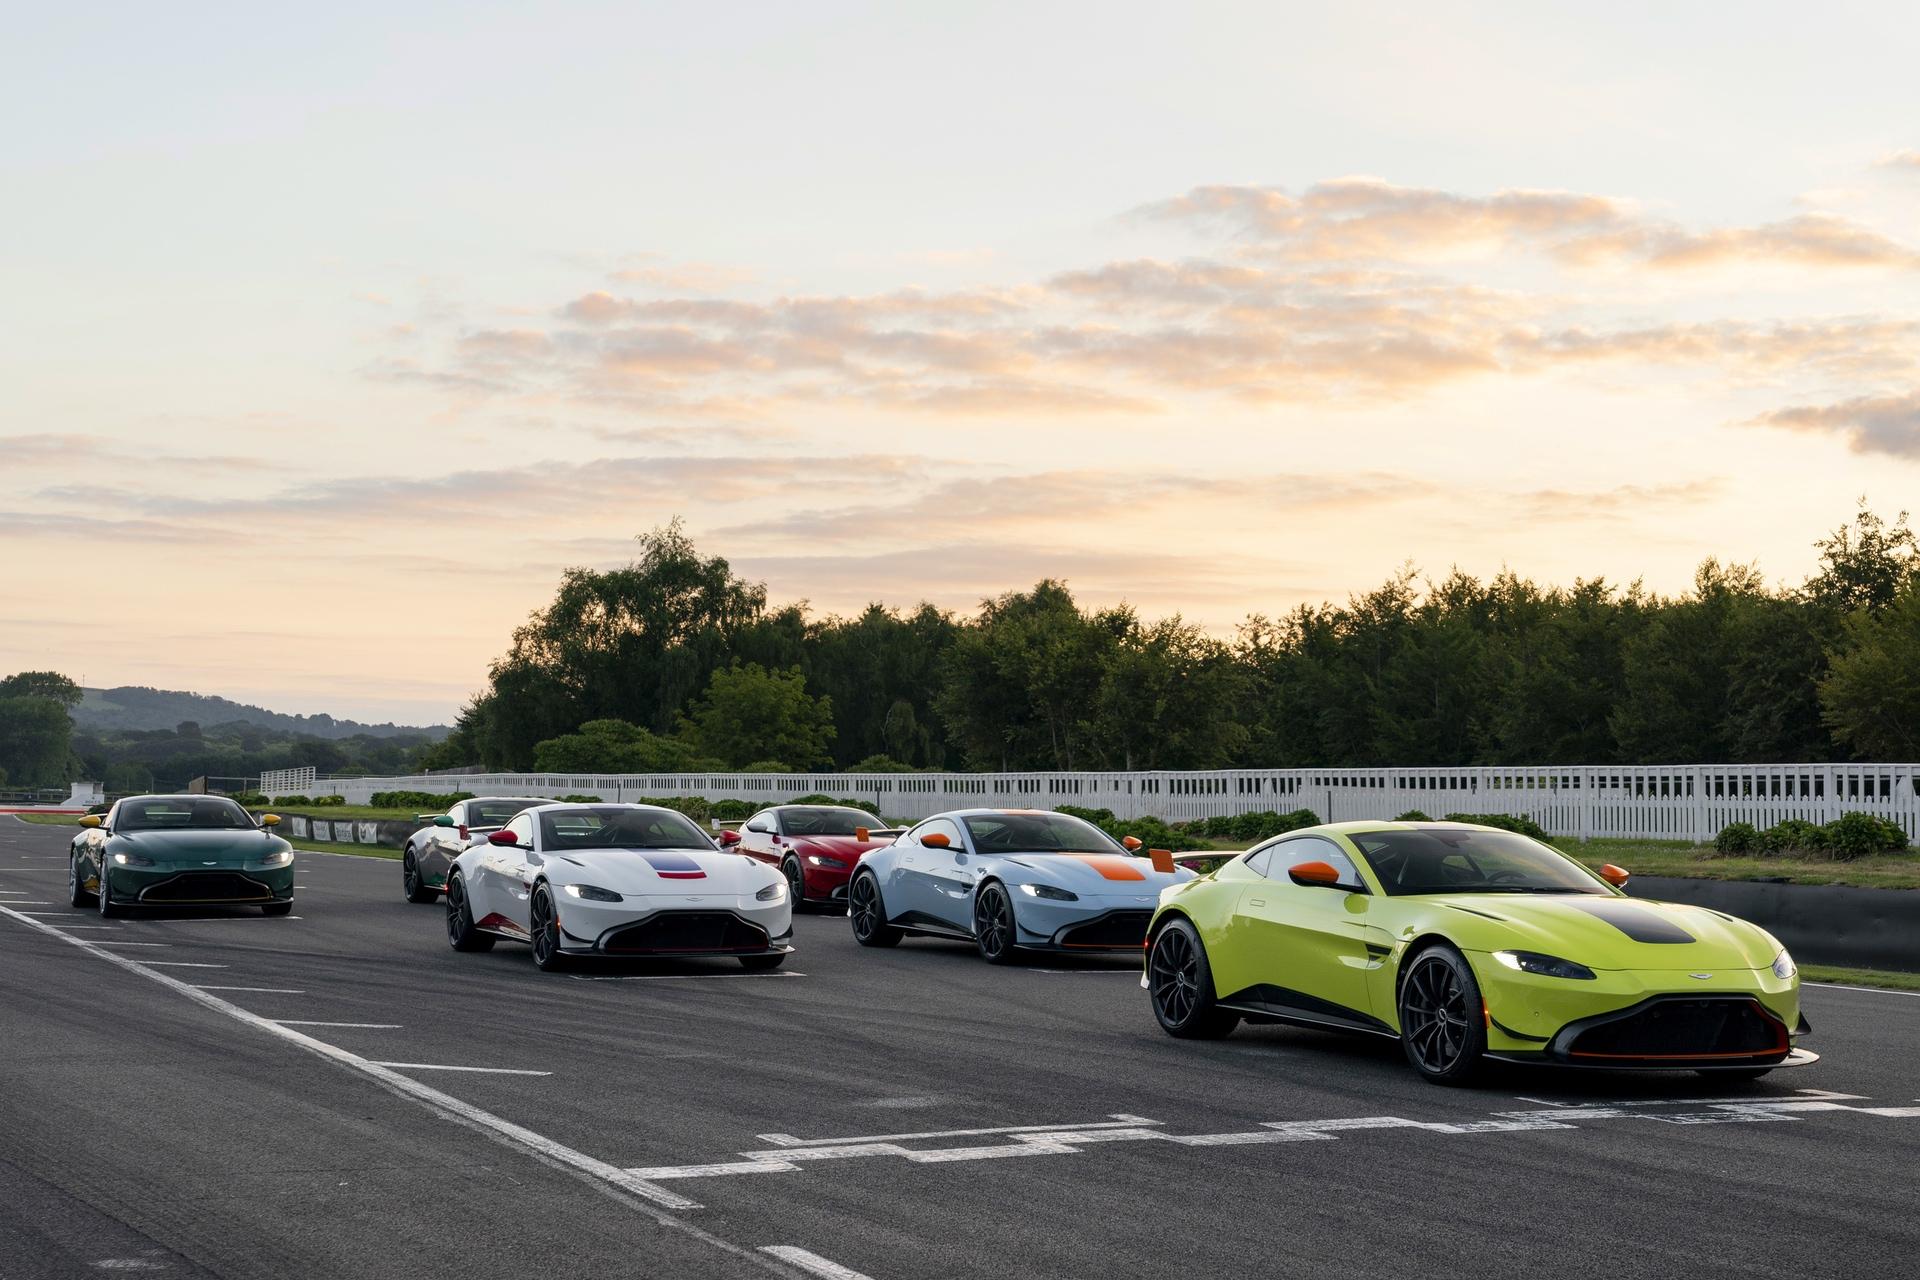 Aston-Martin_Goodwood-FoS-2019_12